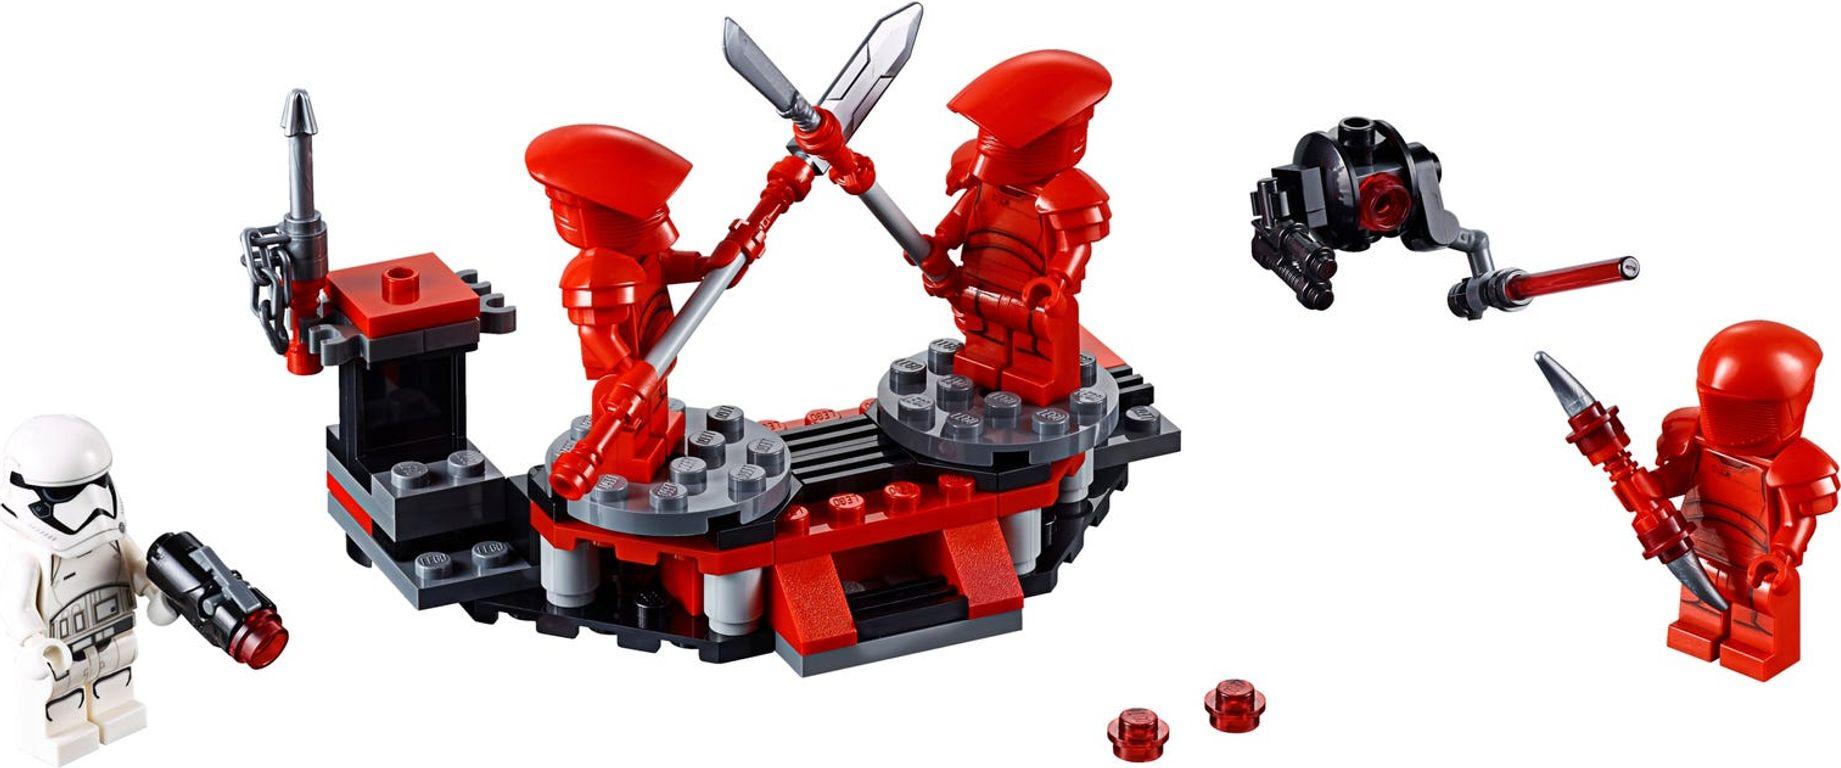 LEGO® Star Wars Elite Praetorian Guard™ Battle Pack components